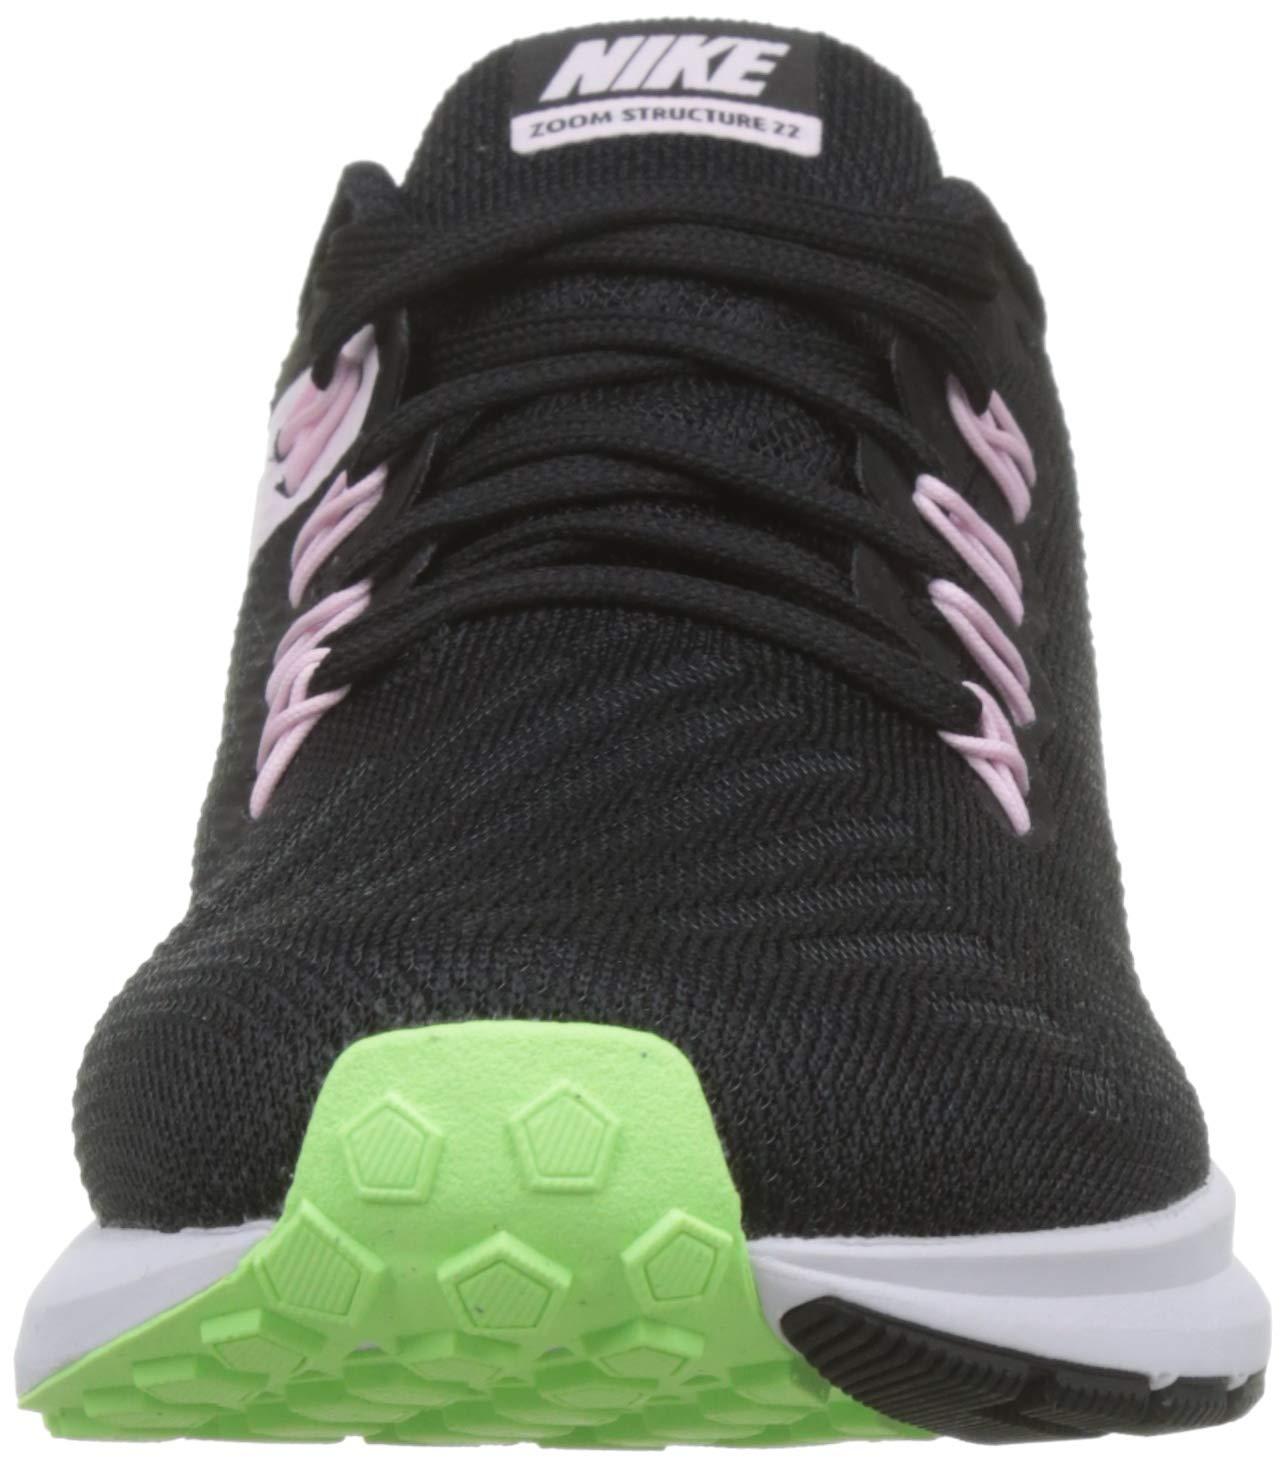 Nike Damen Air Zoom Structure 22 Leichtathletikschuhe, schwarzMehrfarbig, EU